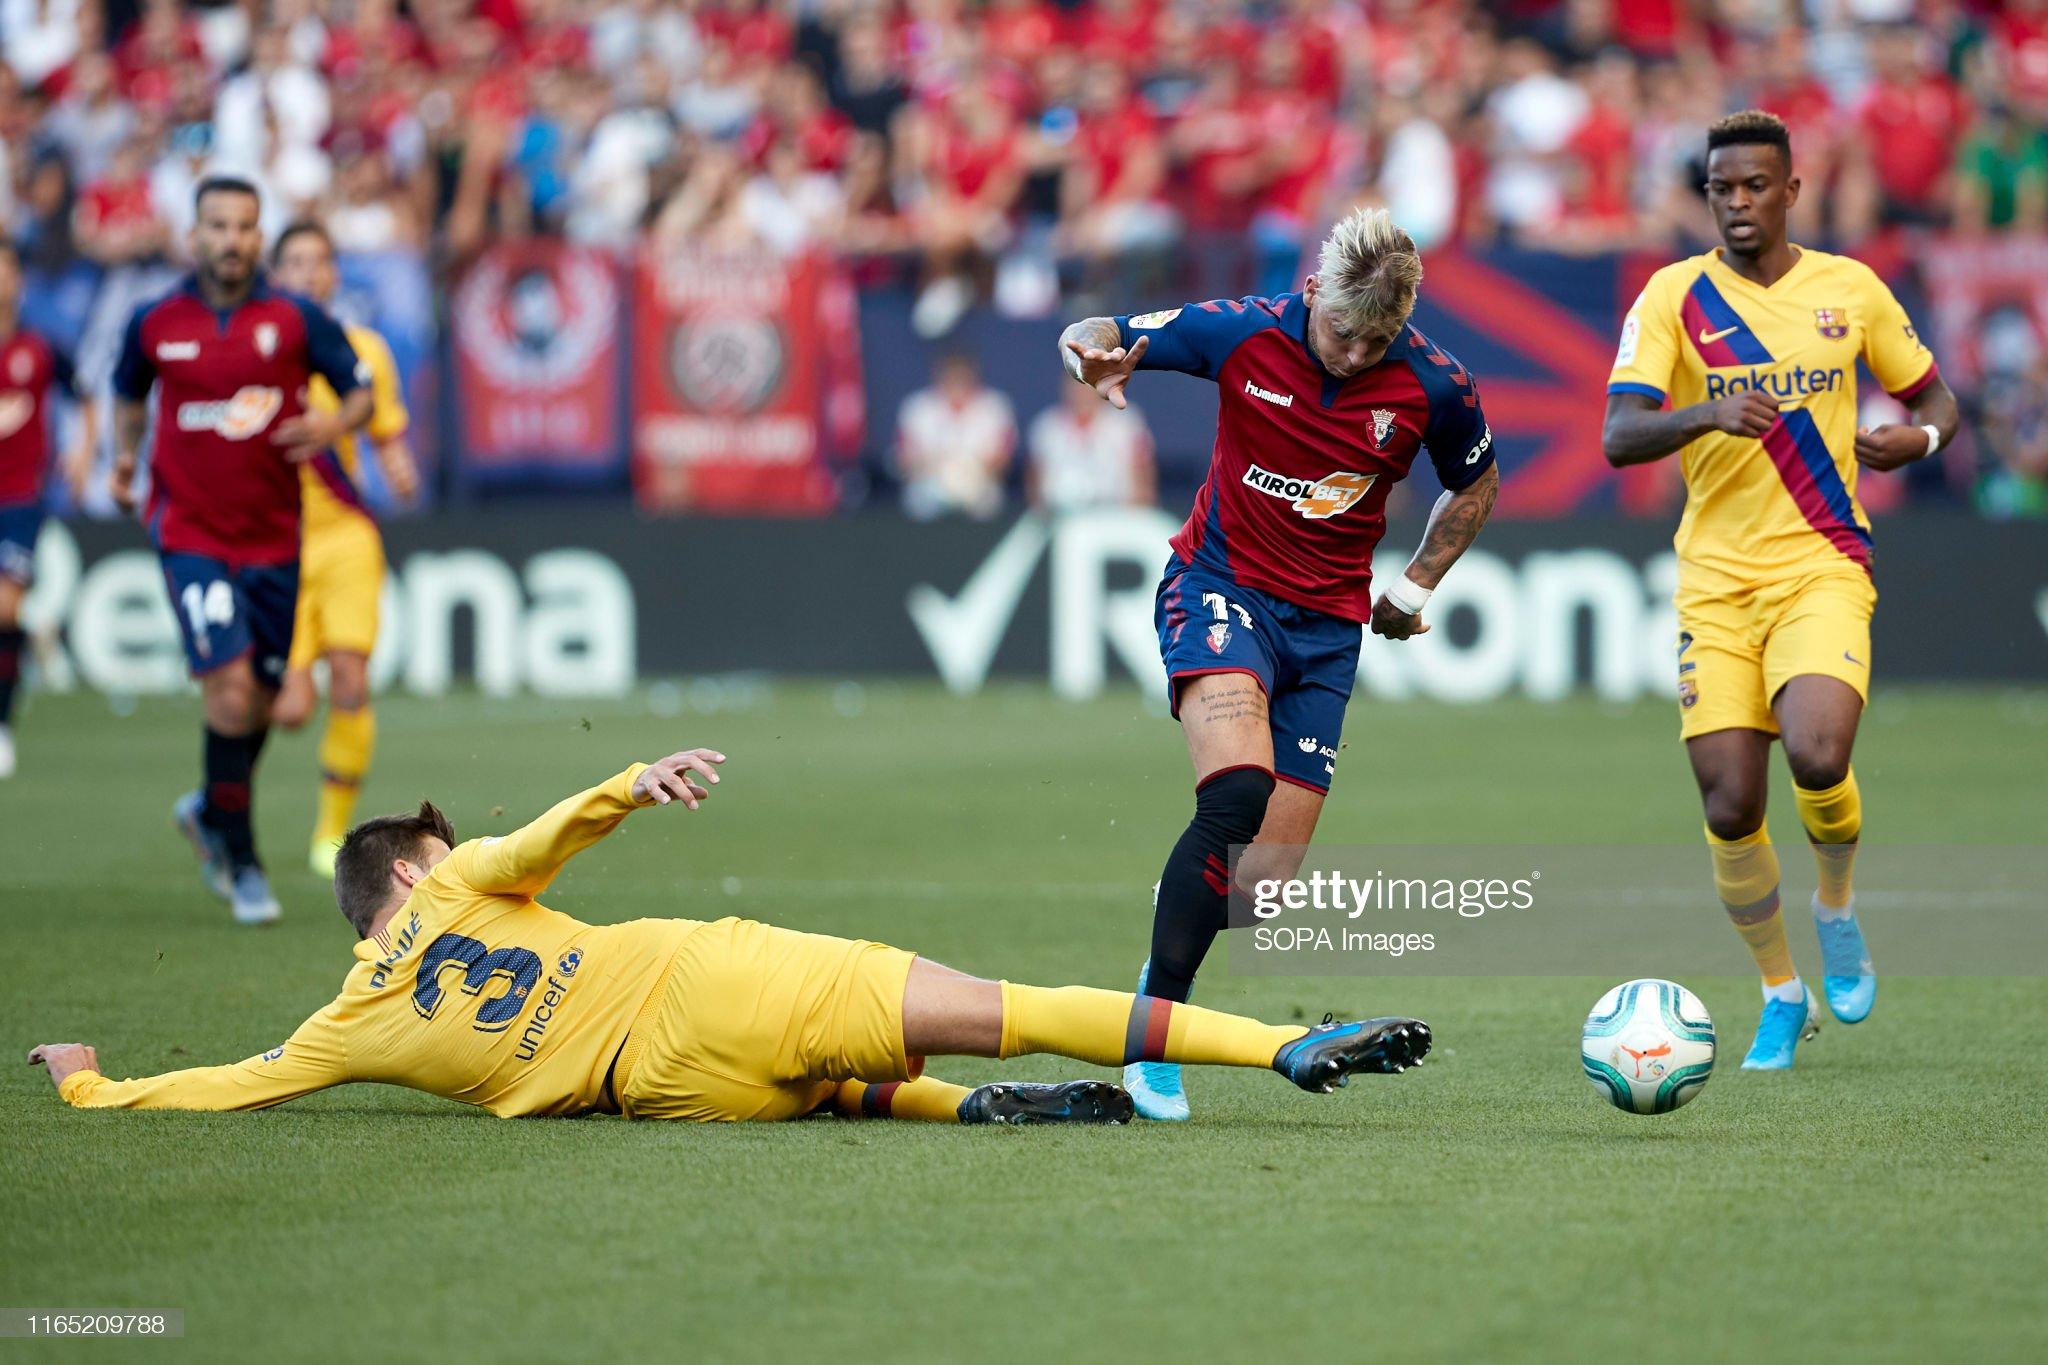 صور مباراة : أوساسونا - برشلونة 2-2 ( 31-08-2019 )  Brandon-thomas-llamas-gerard-piqu-and-nelson-semedo-in-action-during-picture-id1165209788?s=2048x2048